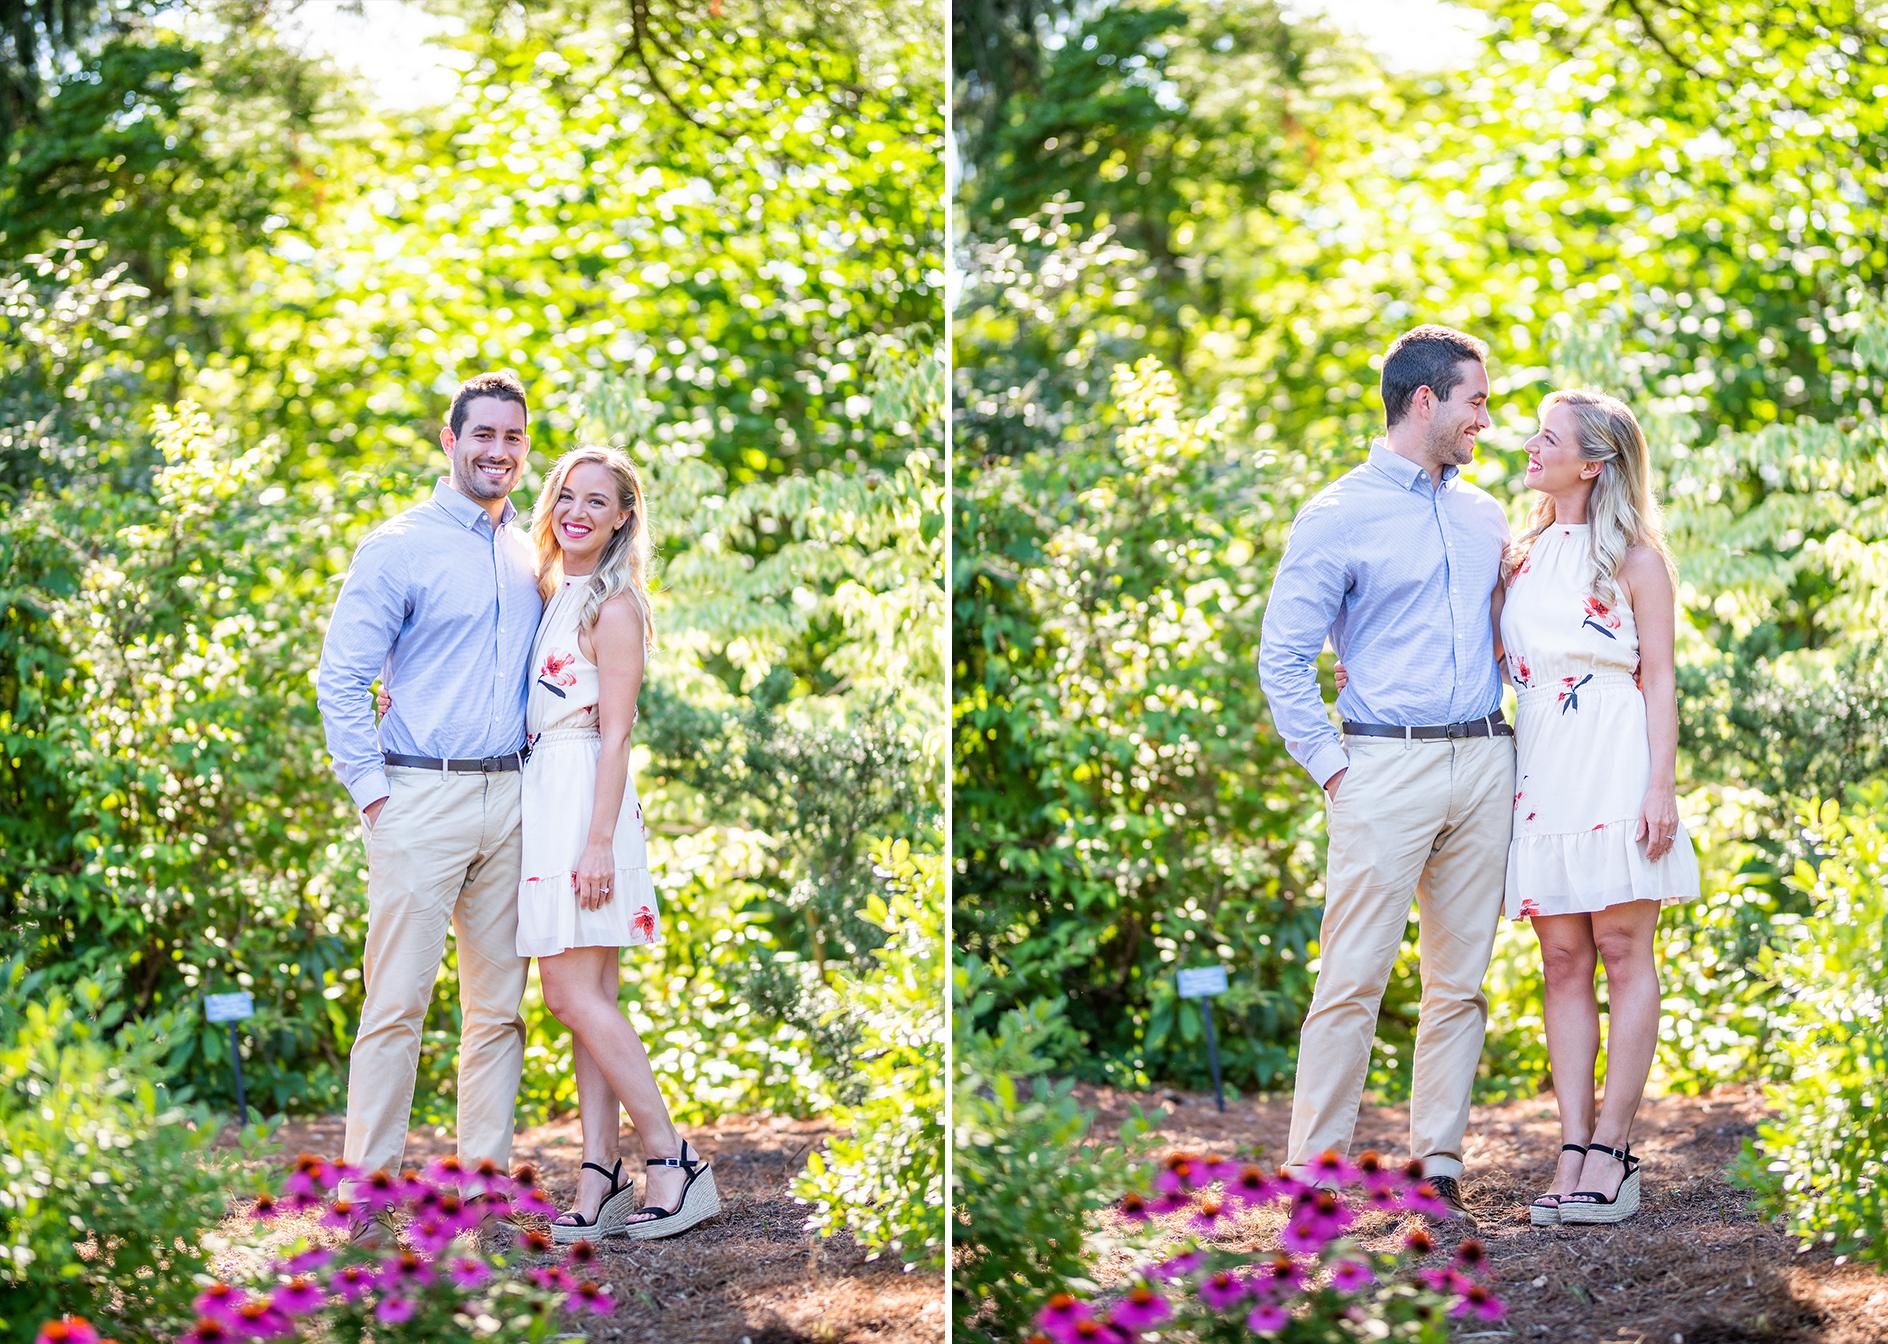 Planting Fields Arboretum Engagement Shoot | Oyster Bay Engagement Shoot | Long Island Wedding Photographer2